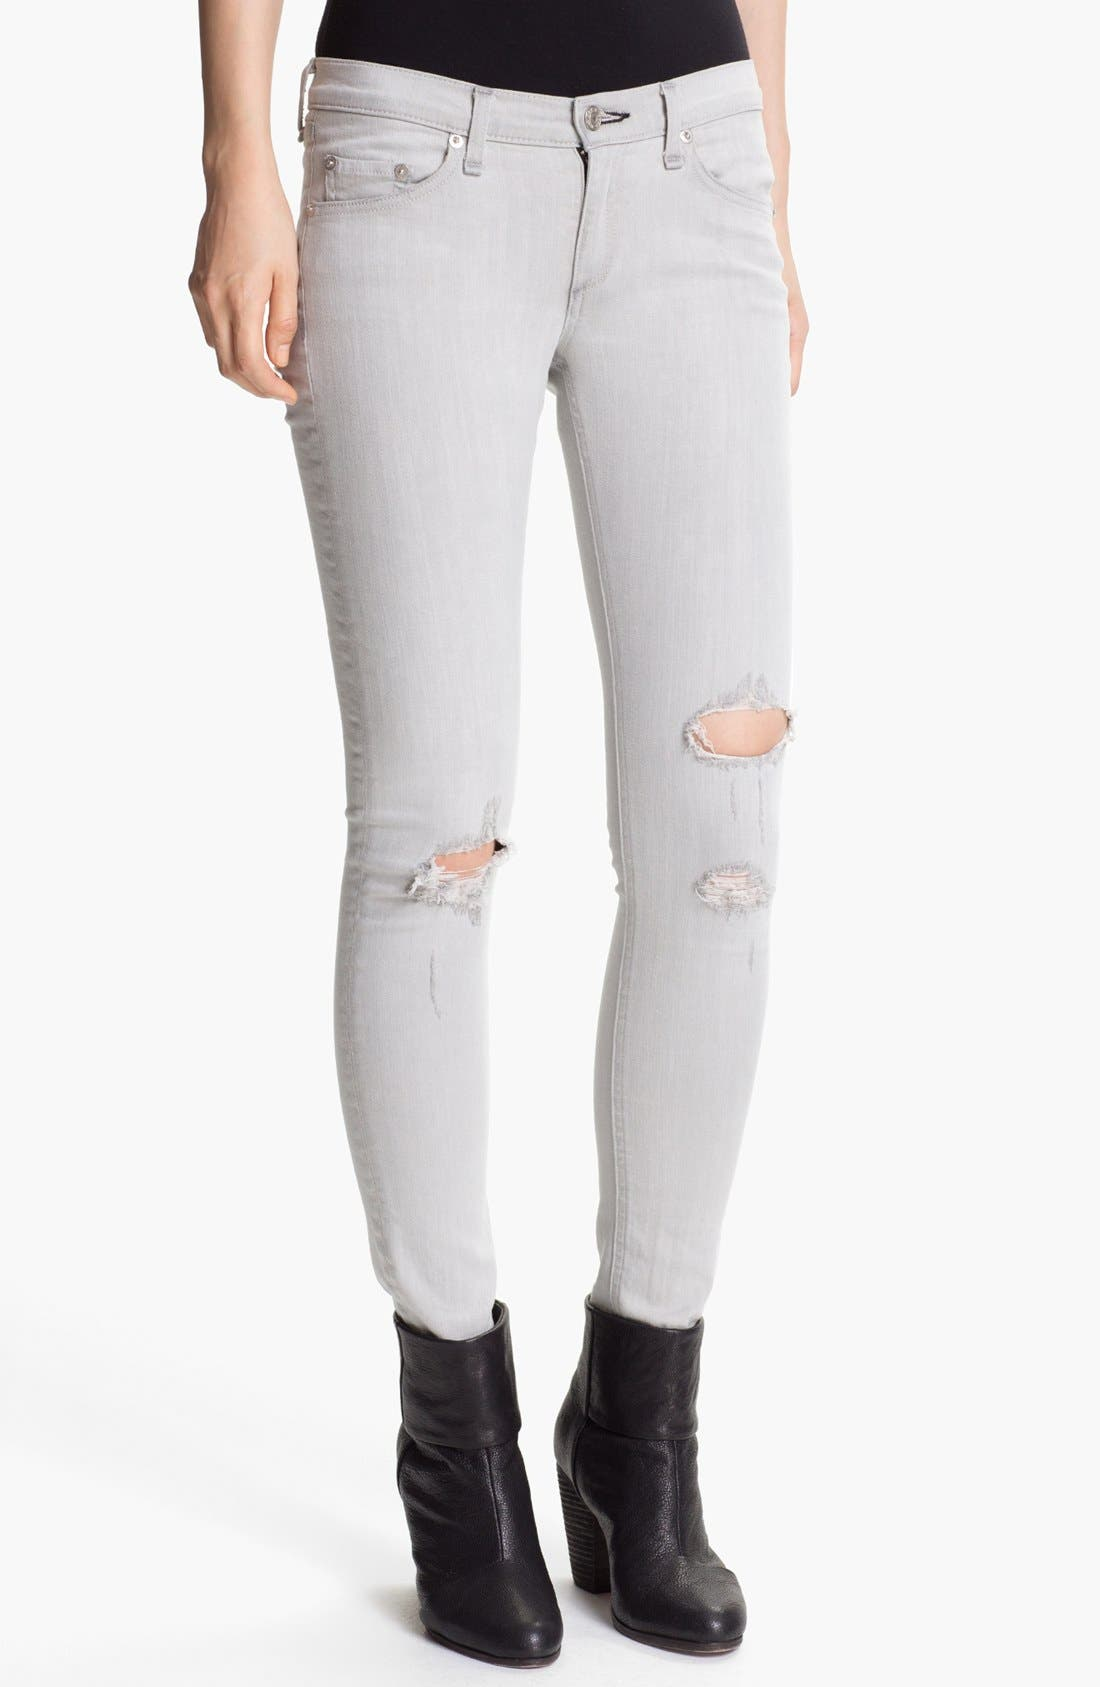 Main Image - rag & bone/JEAN 'The Skinny' Stretch Jeans (Surrey)